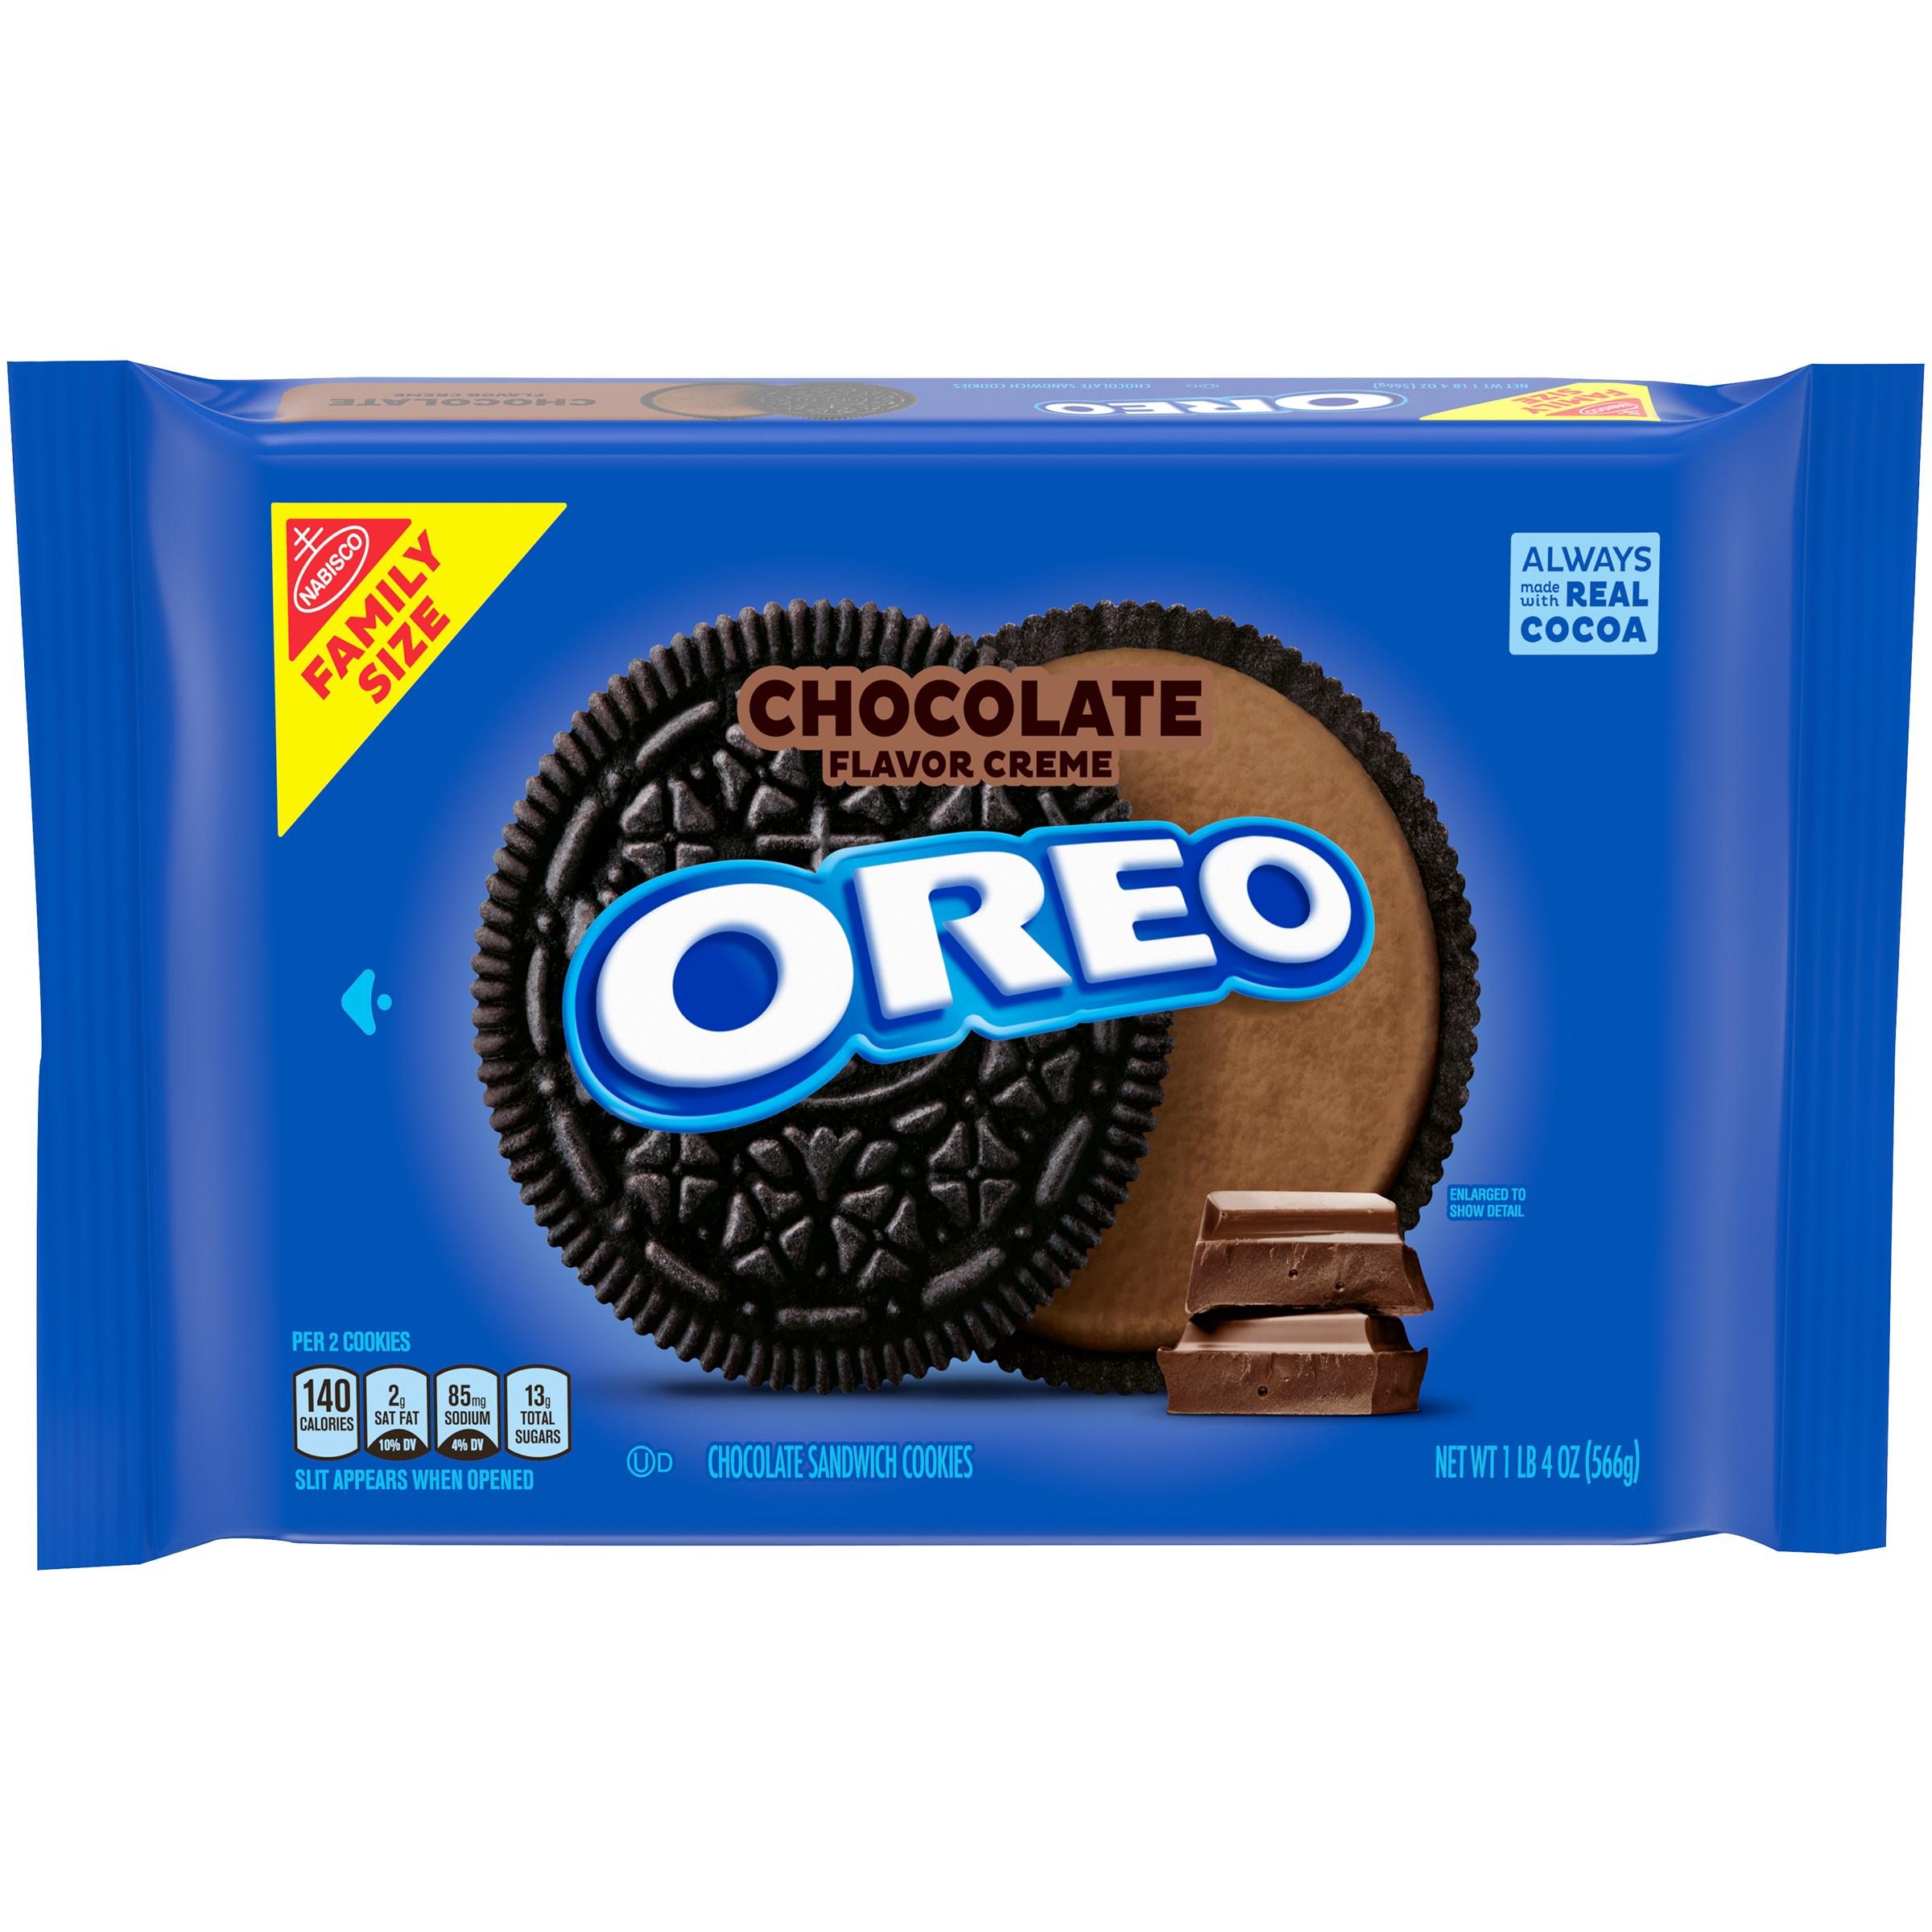 OREO Chocolate Cream Sandwich Cookies 20 oz